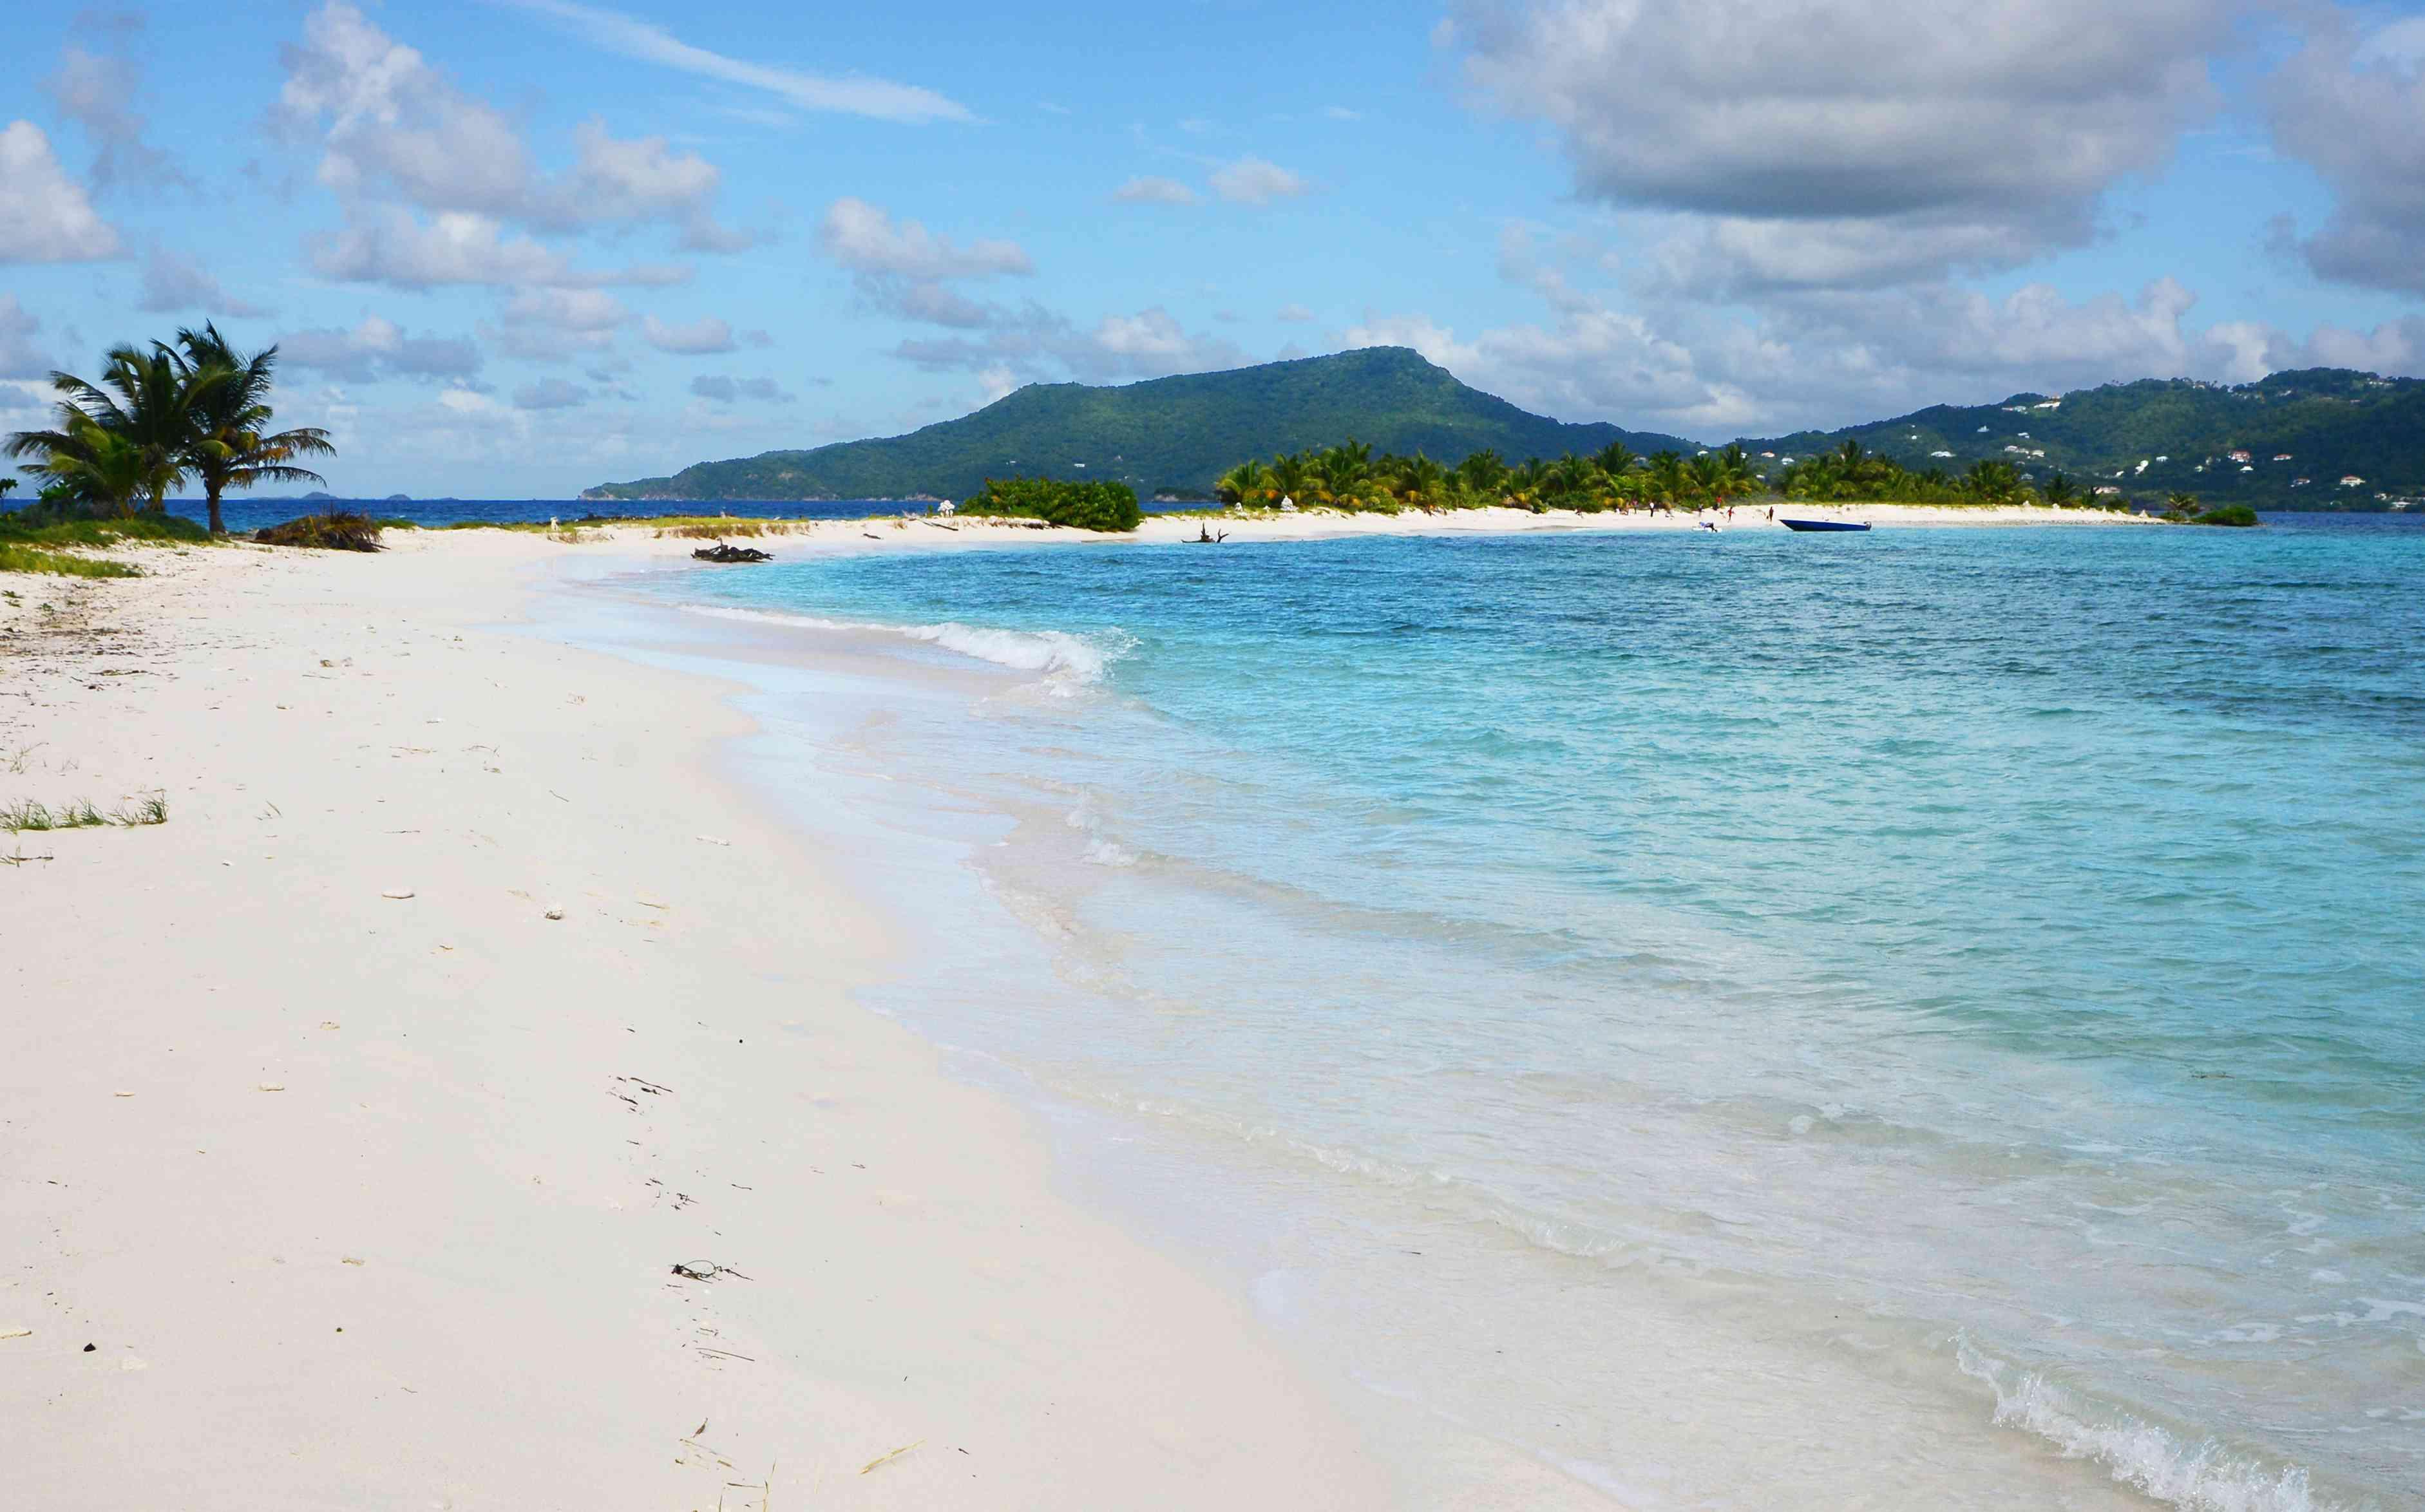 White sand Grande Anse Beach, Grenada, with bright blue waters